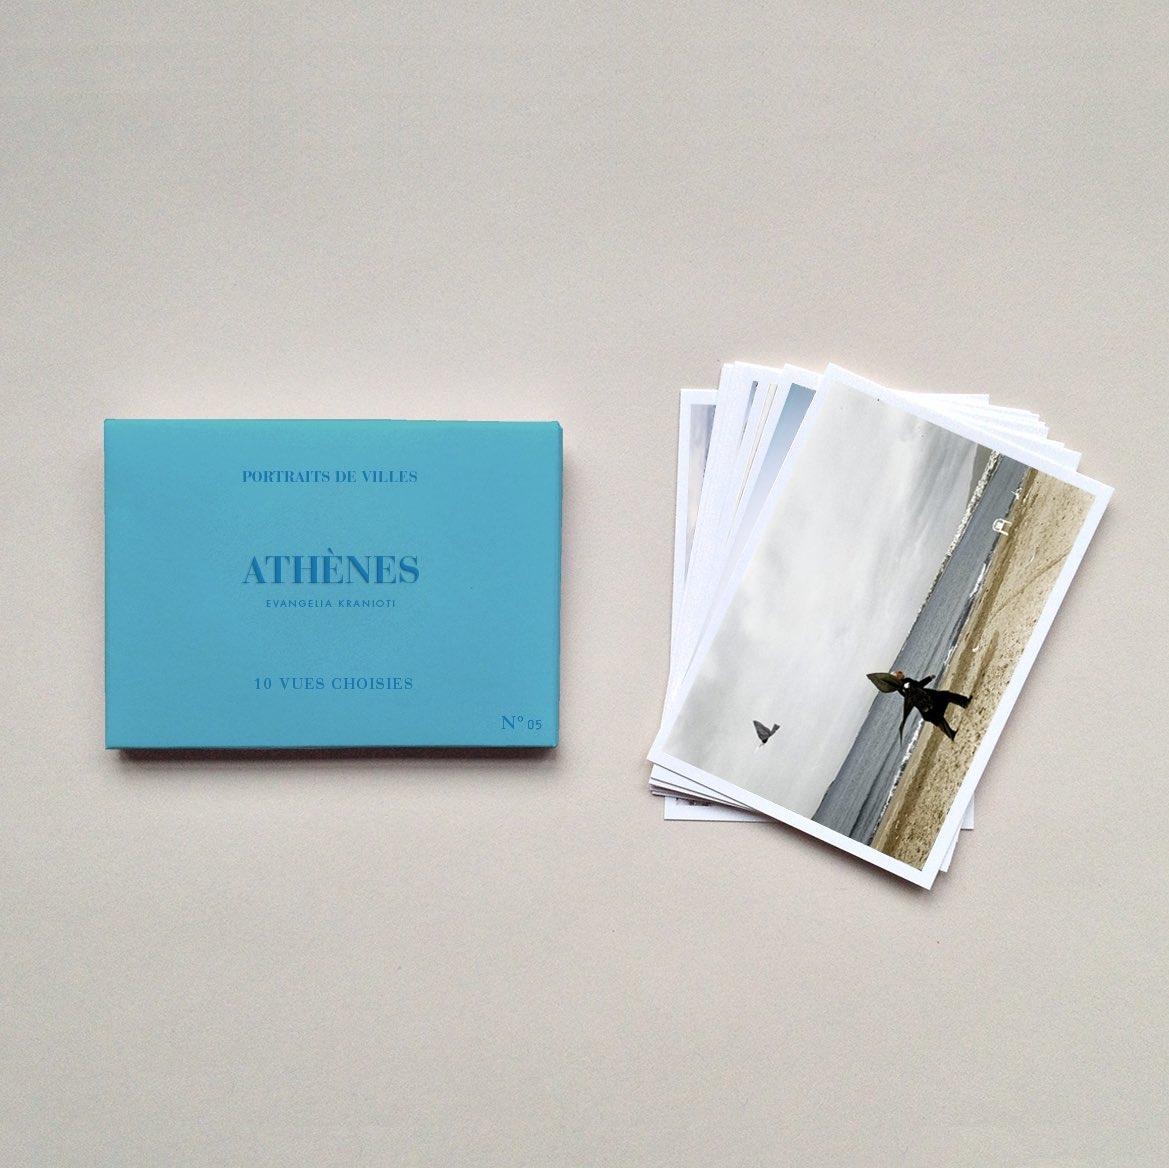 The Vues Choisies – Athènes